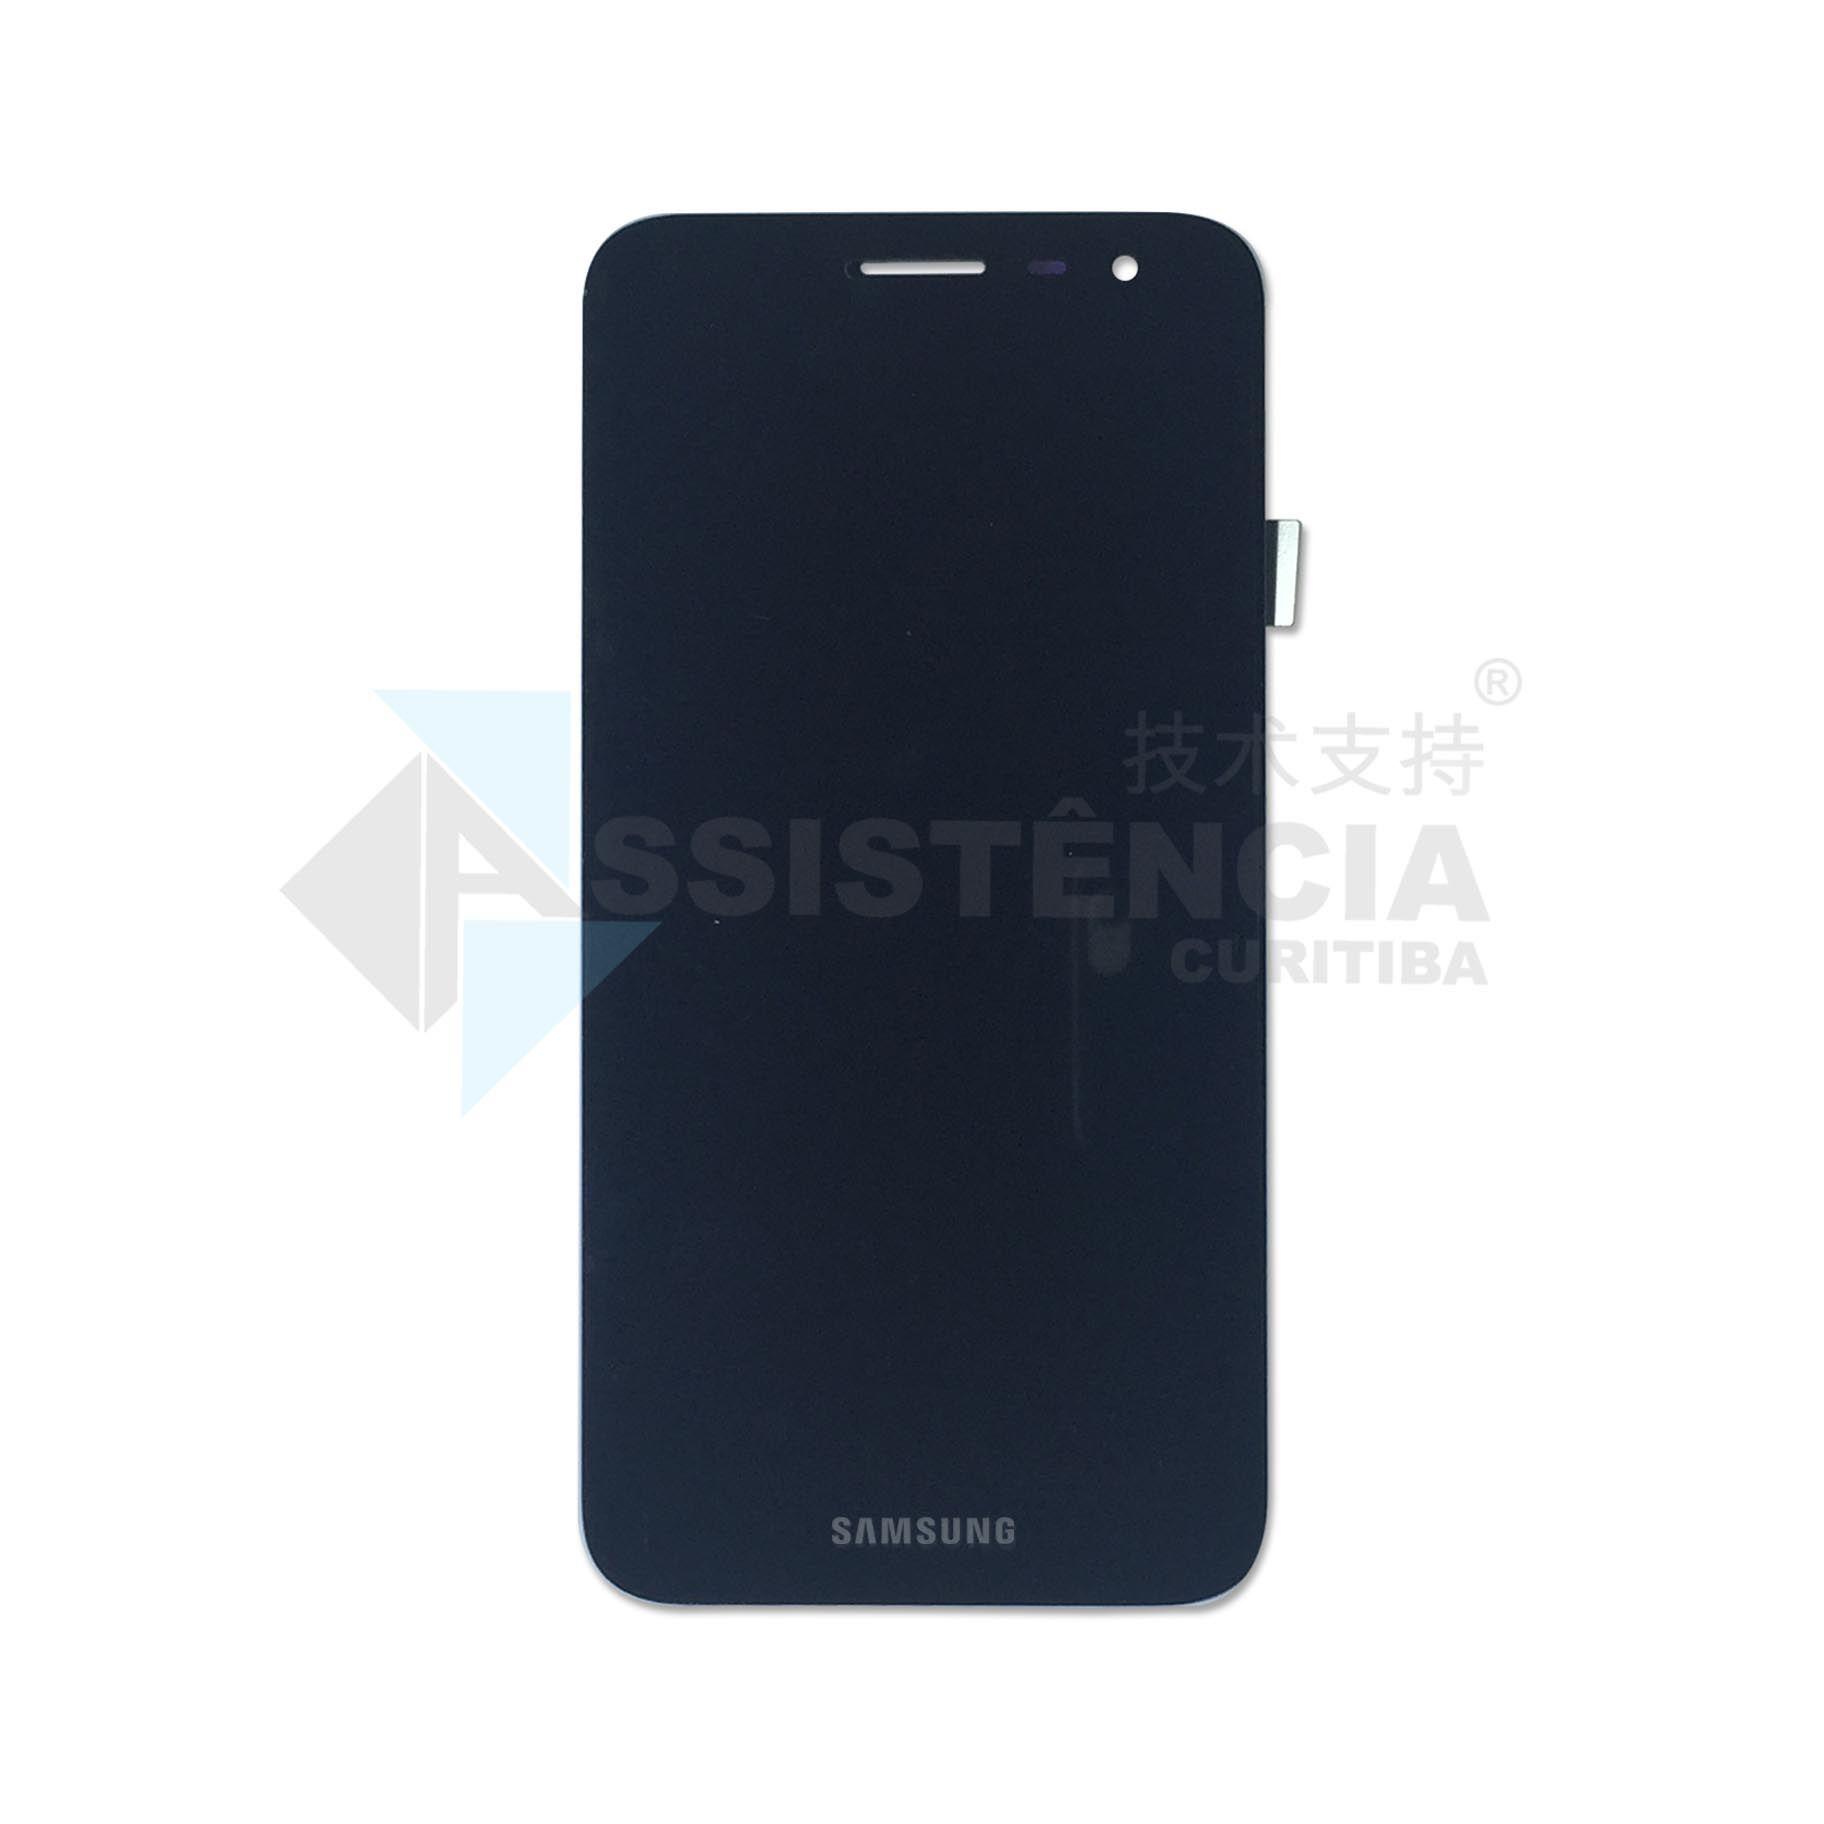 Tela Display Samsung Galaxy J2 Core J260 1ª Linha Incell